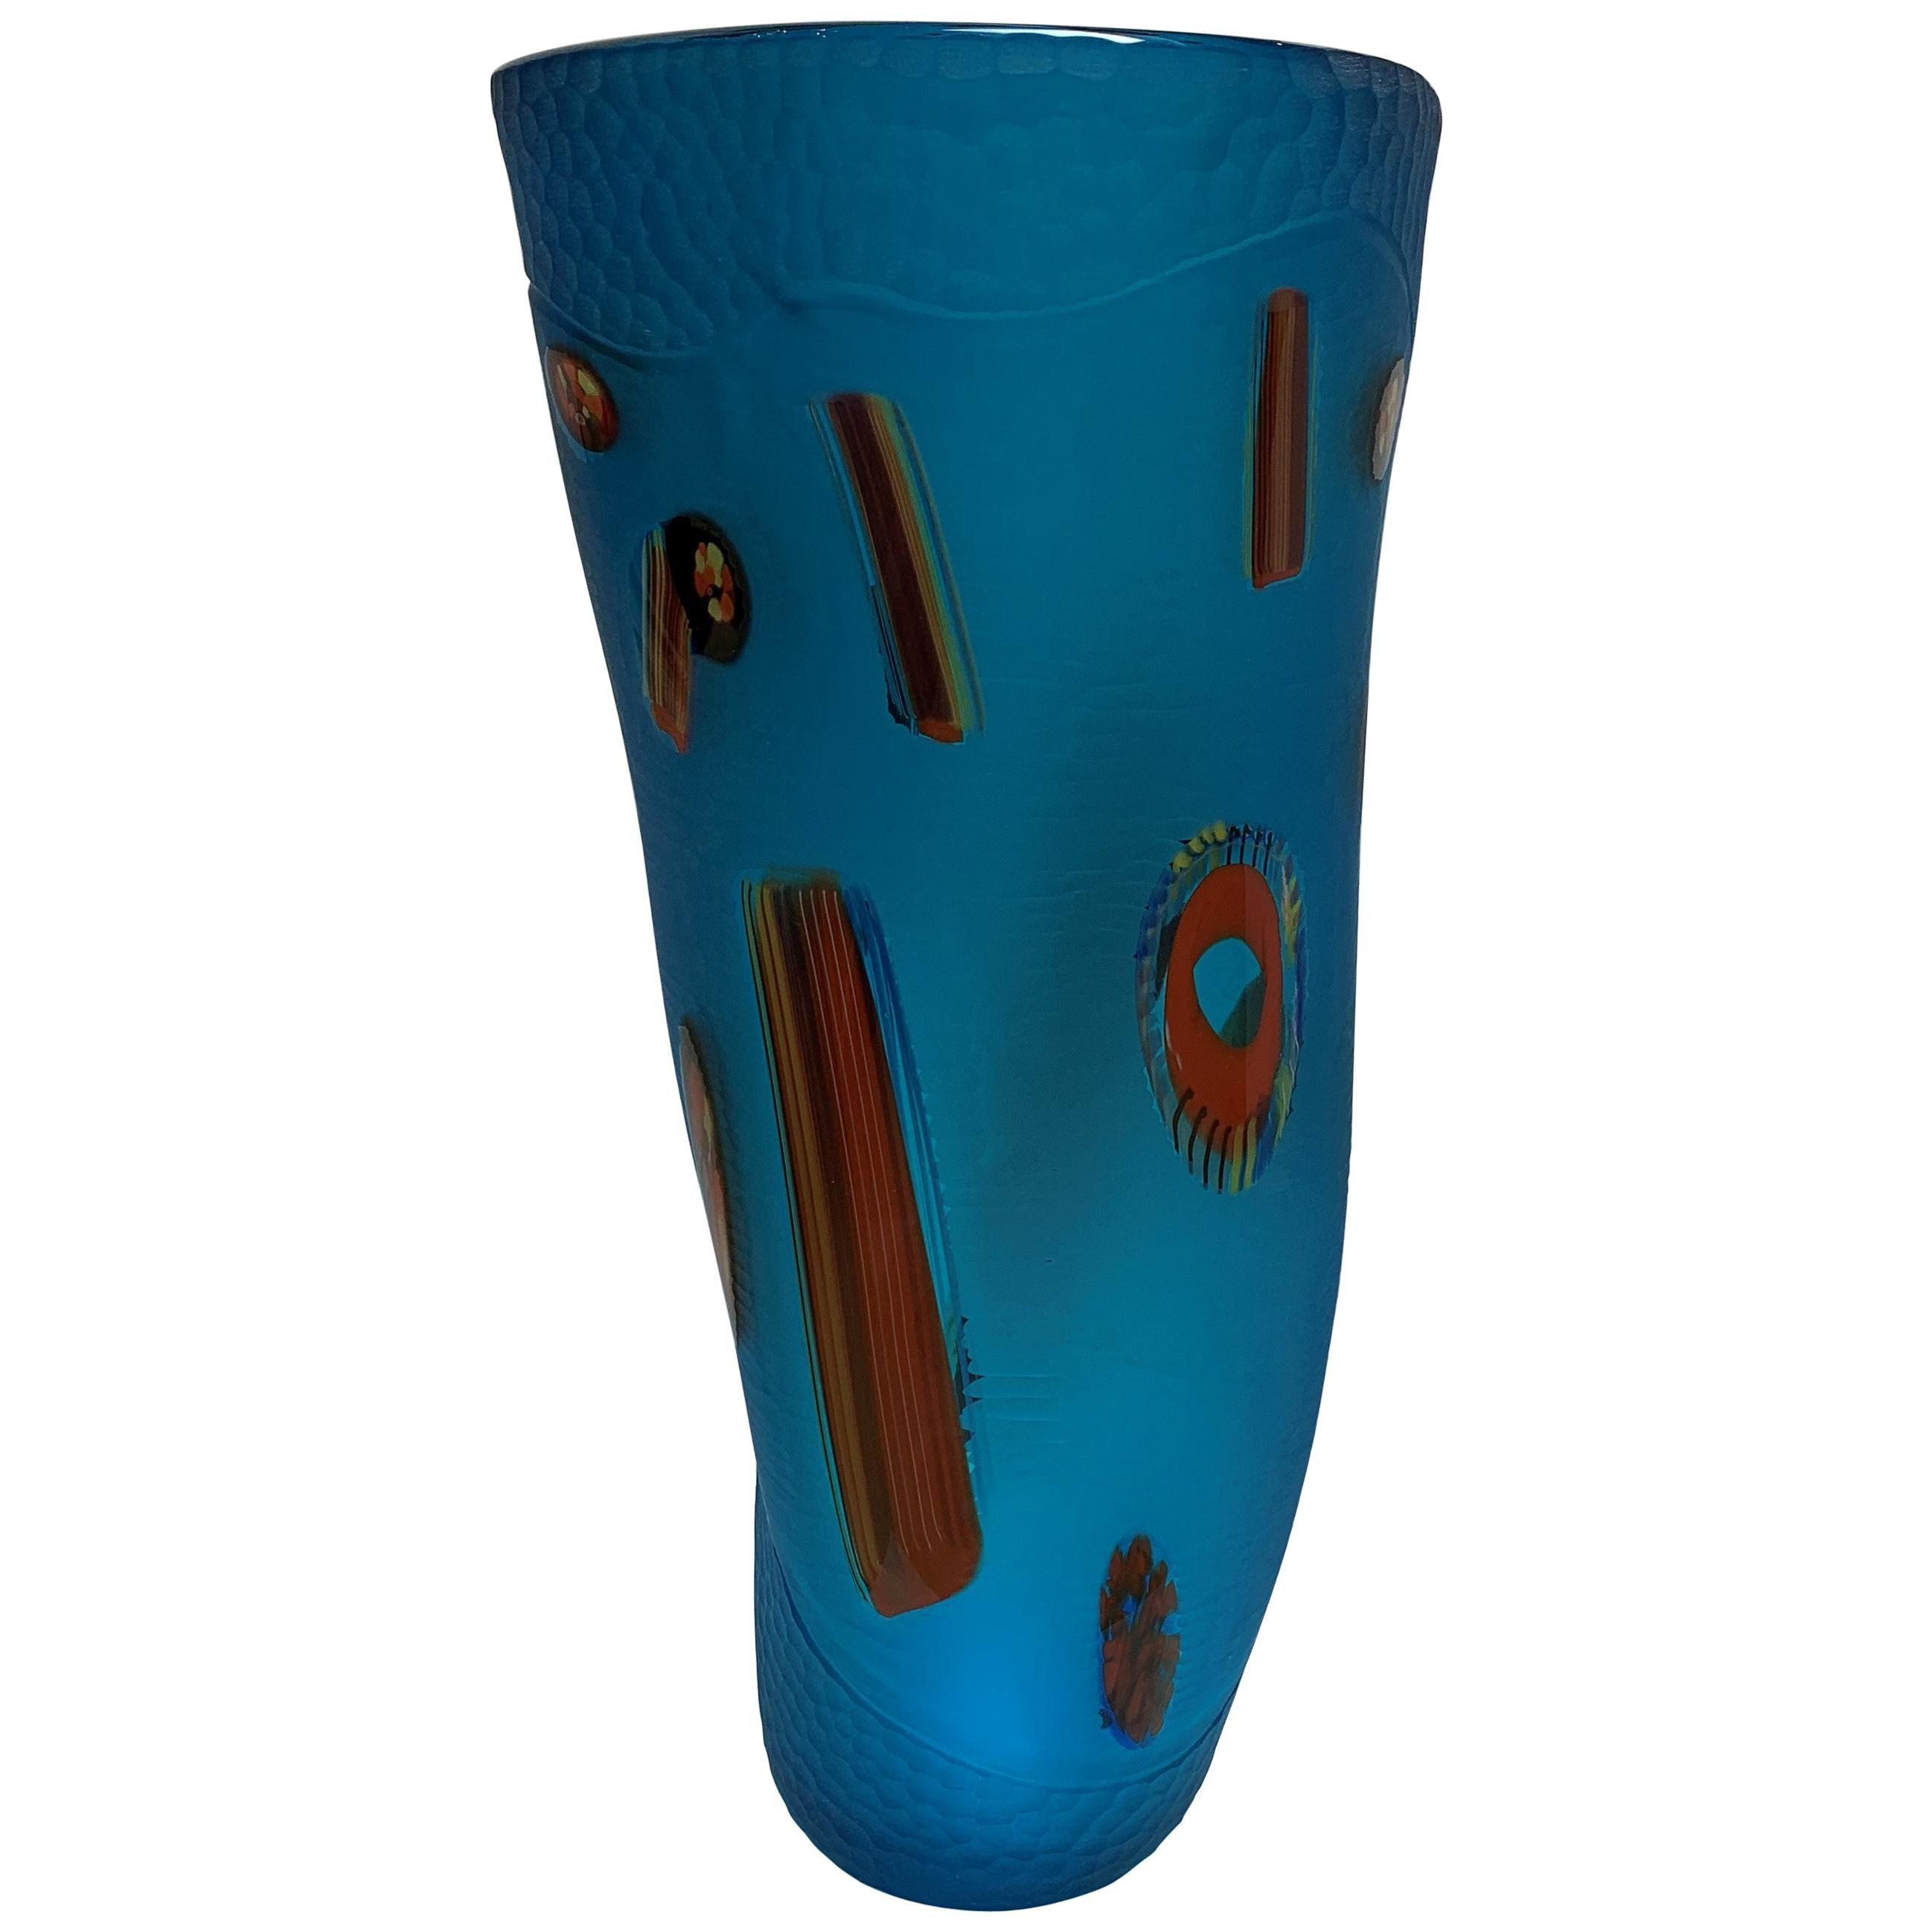 Aqua Monumental Organic Freeform Venetian Art Glass Vase, Signed by David Dona